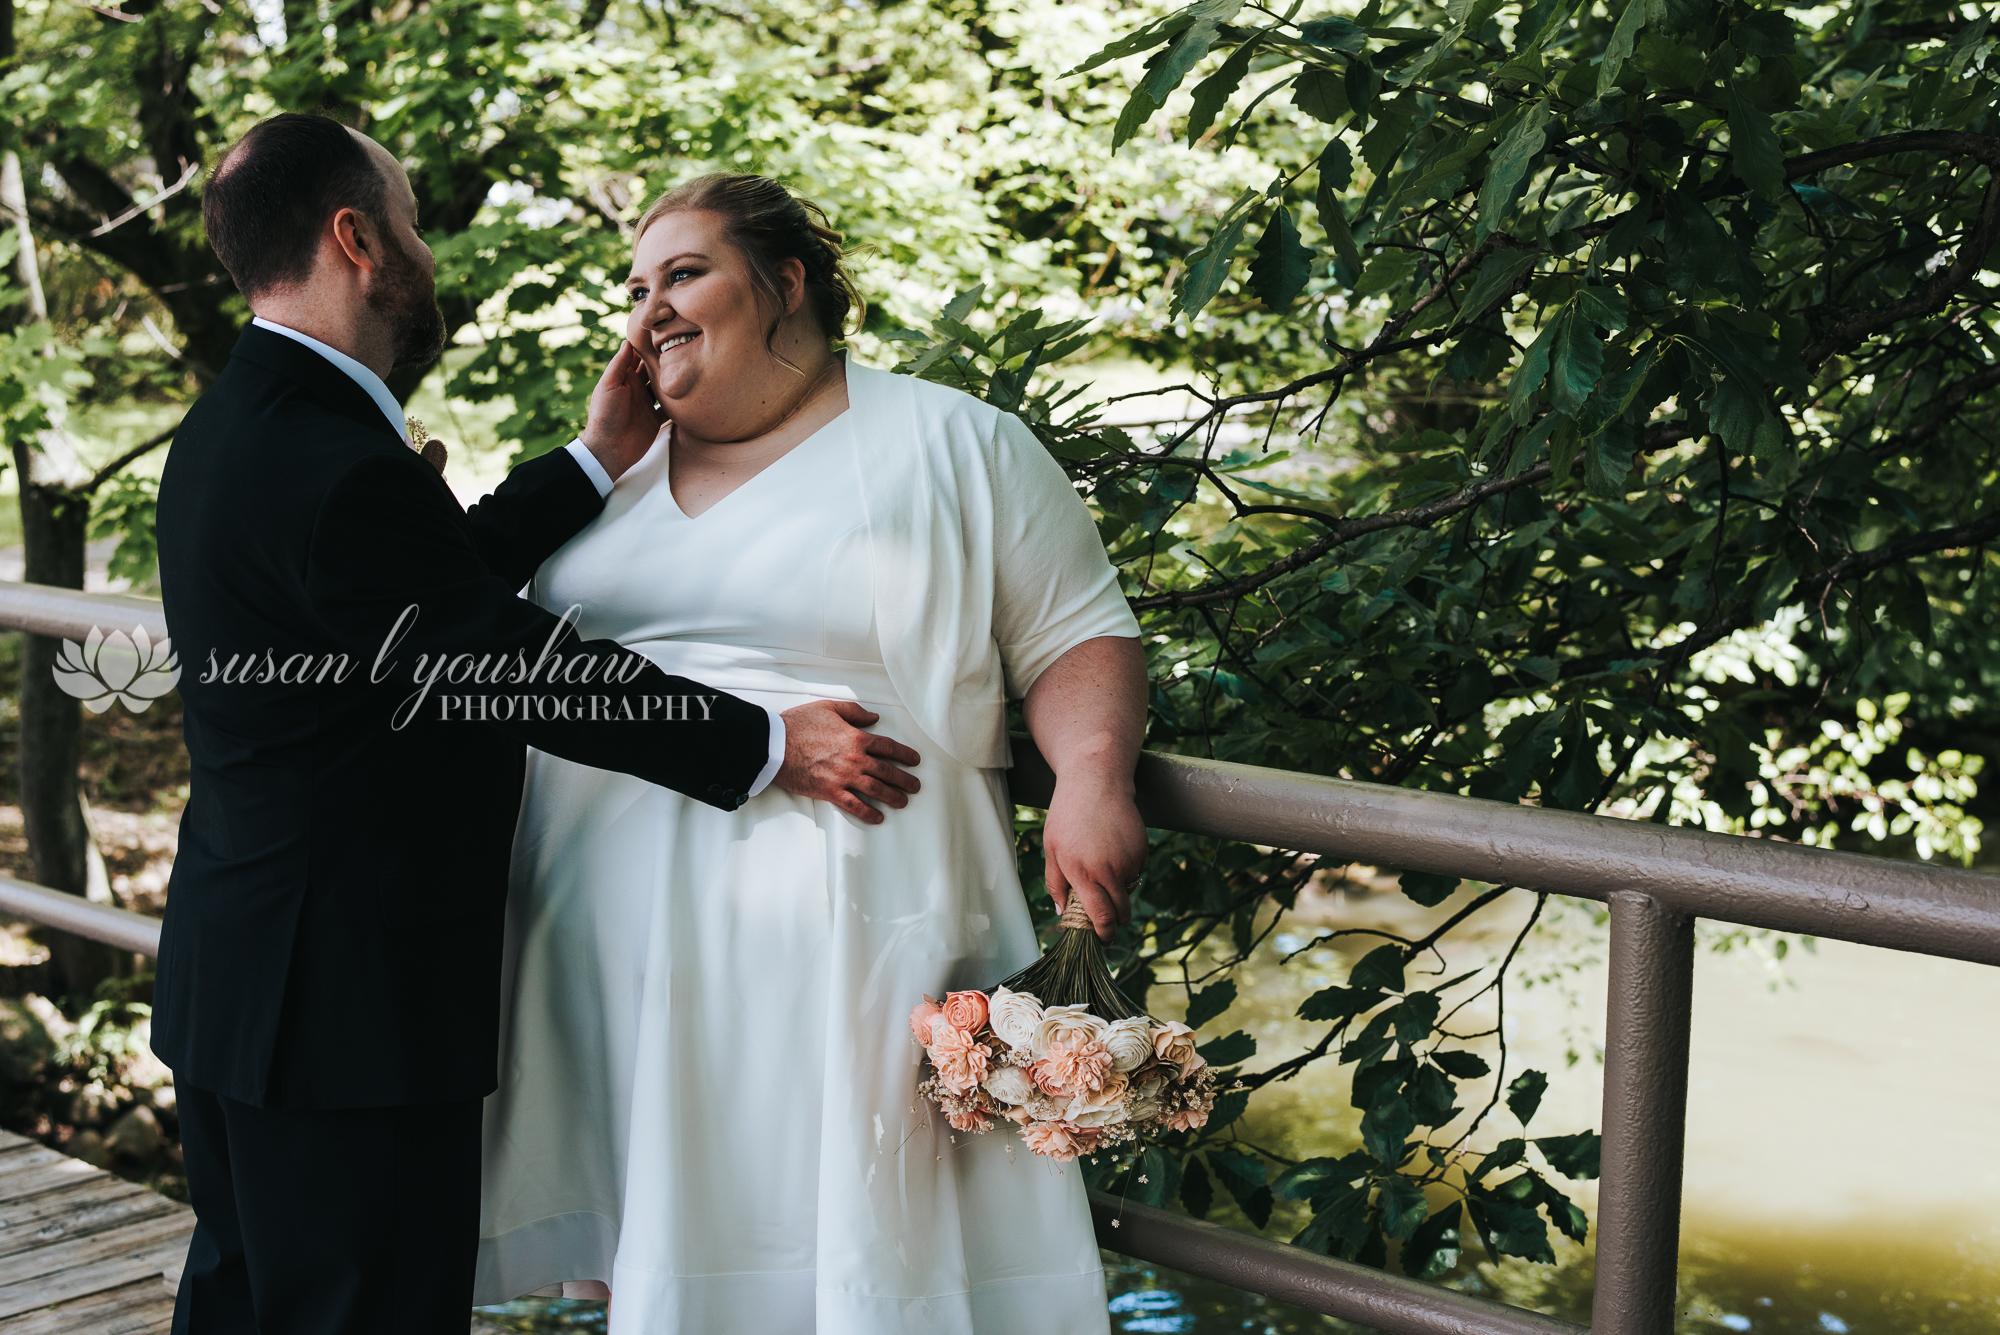 Bill and Sarah Wedding Photos 06-08-2019 SLY Photography -56.jpg